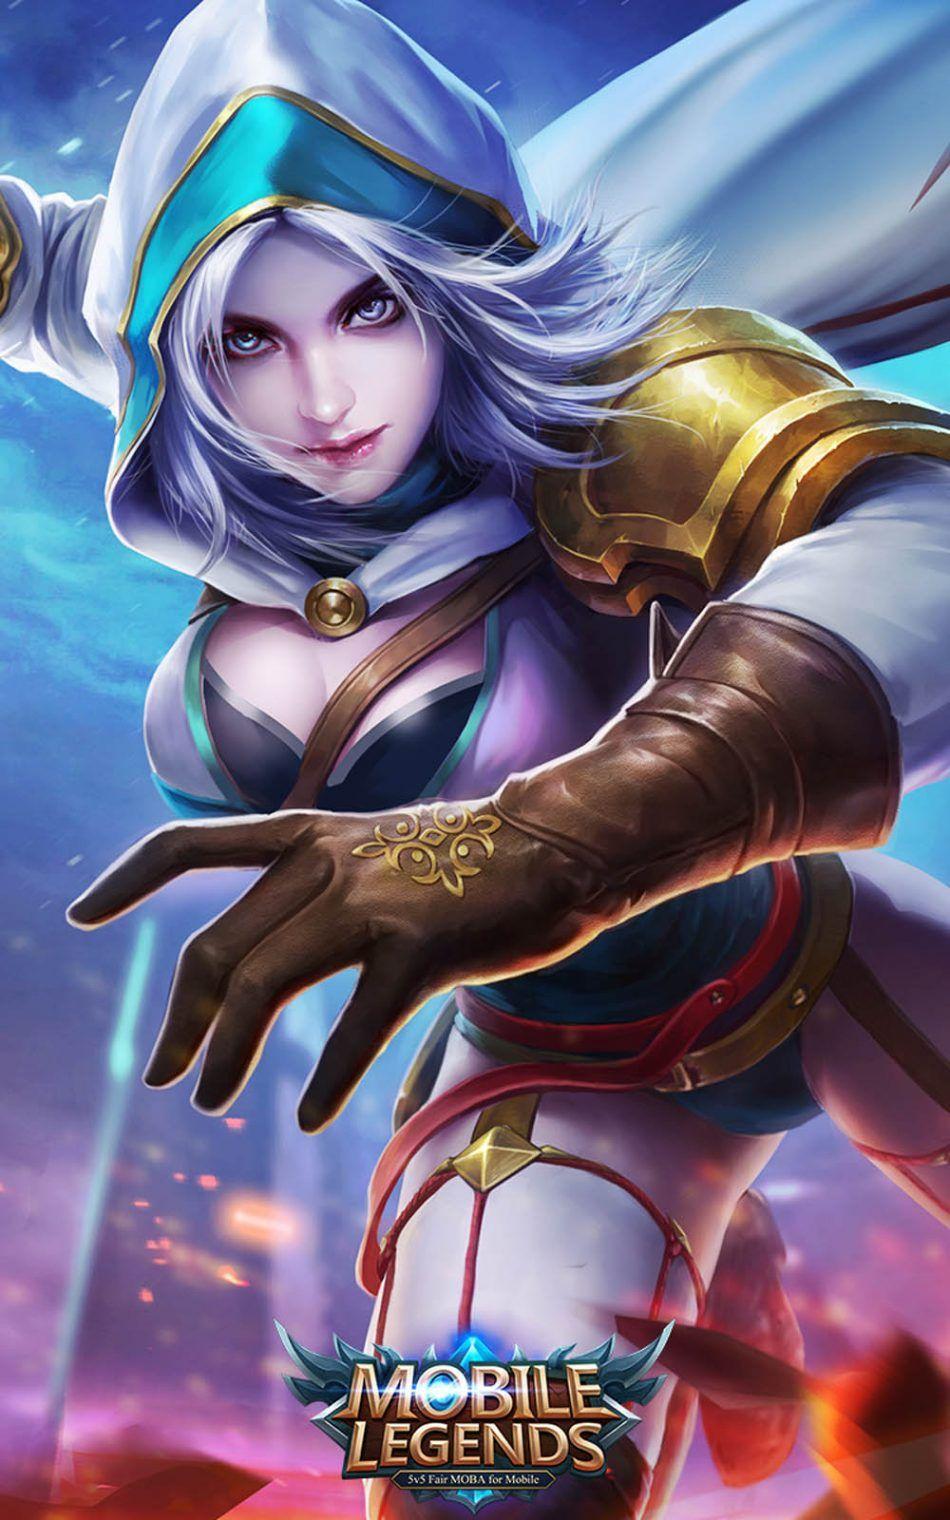 Natalia Mobile Legends Hero Download Free Pure HD